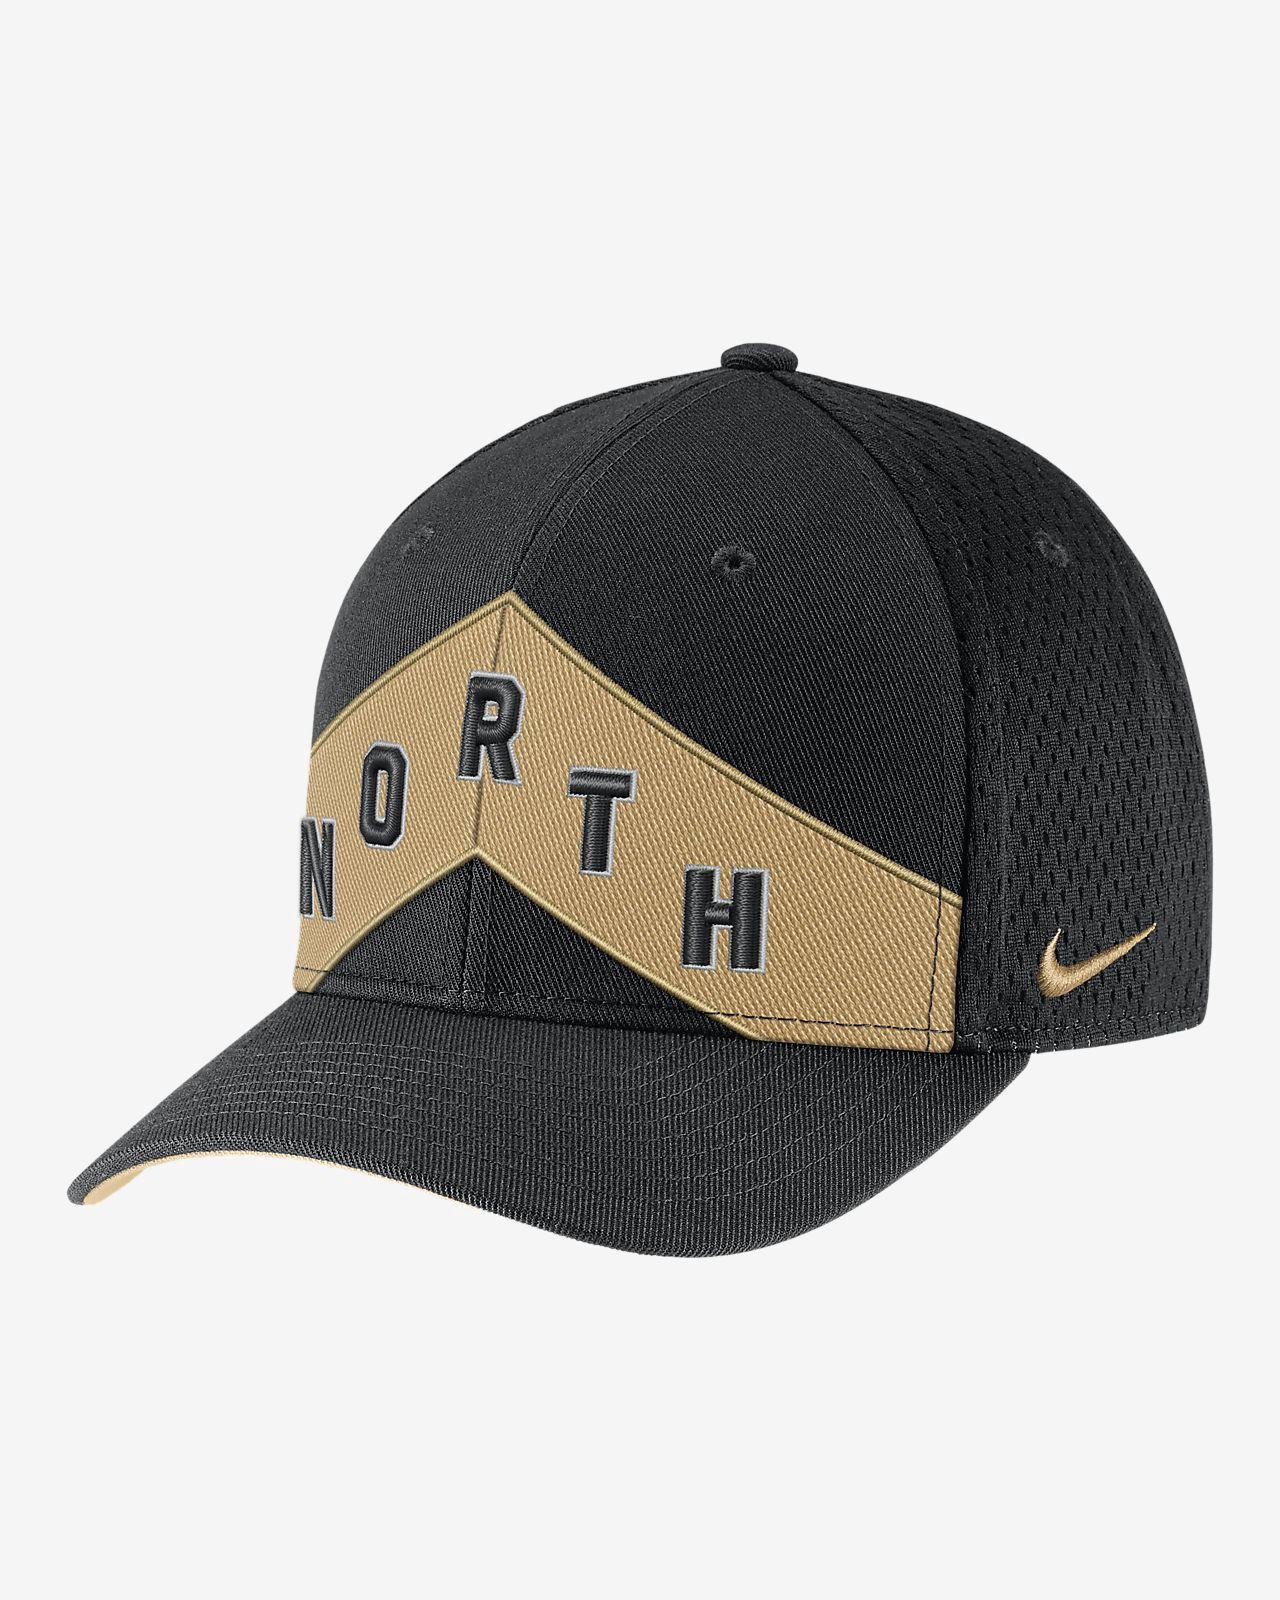 877928ab9e3 Nike Toronto Raptors City Edition Classic99 Unisex Nba Hat - Gold ...